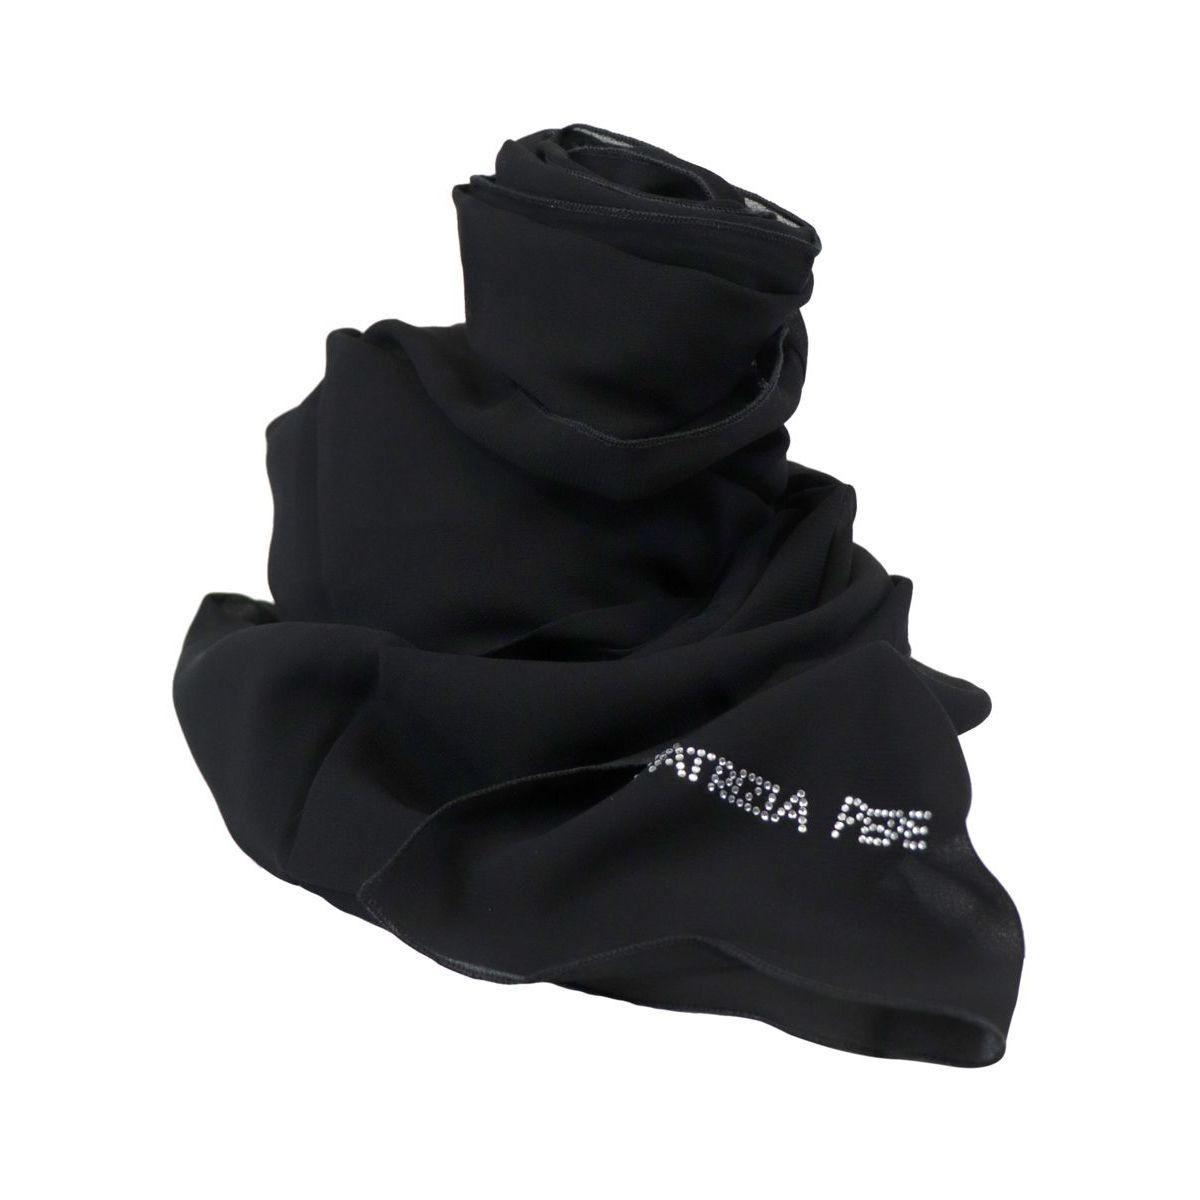 Viscose scarf with rhinestone logo Black Patrizia Pepe